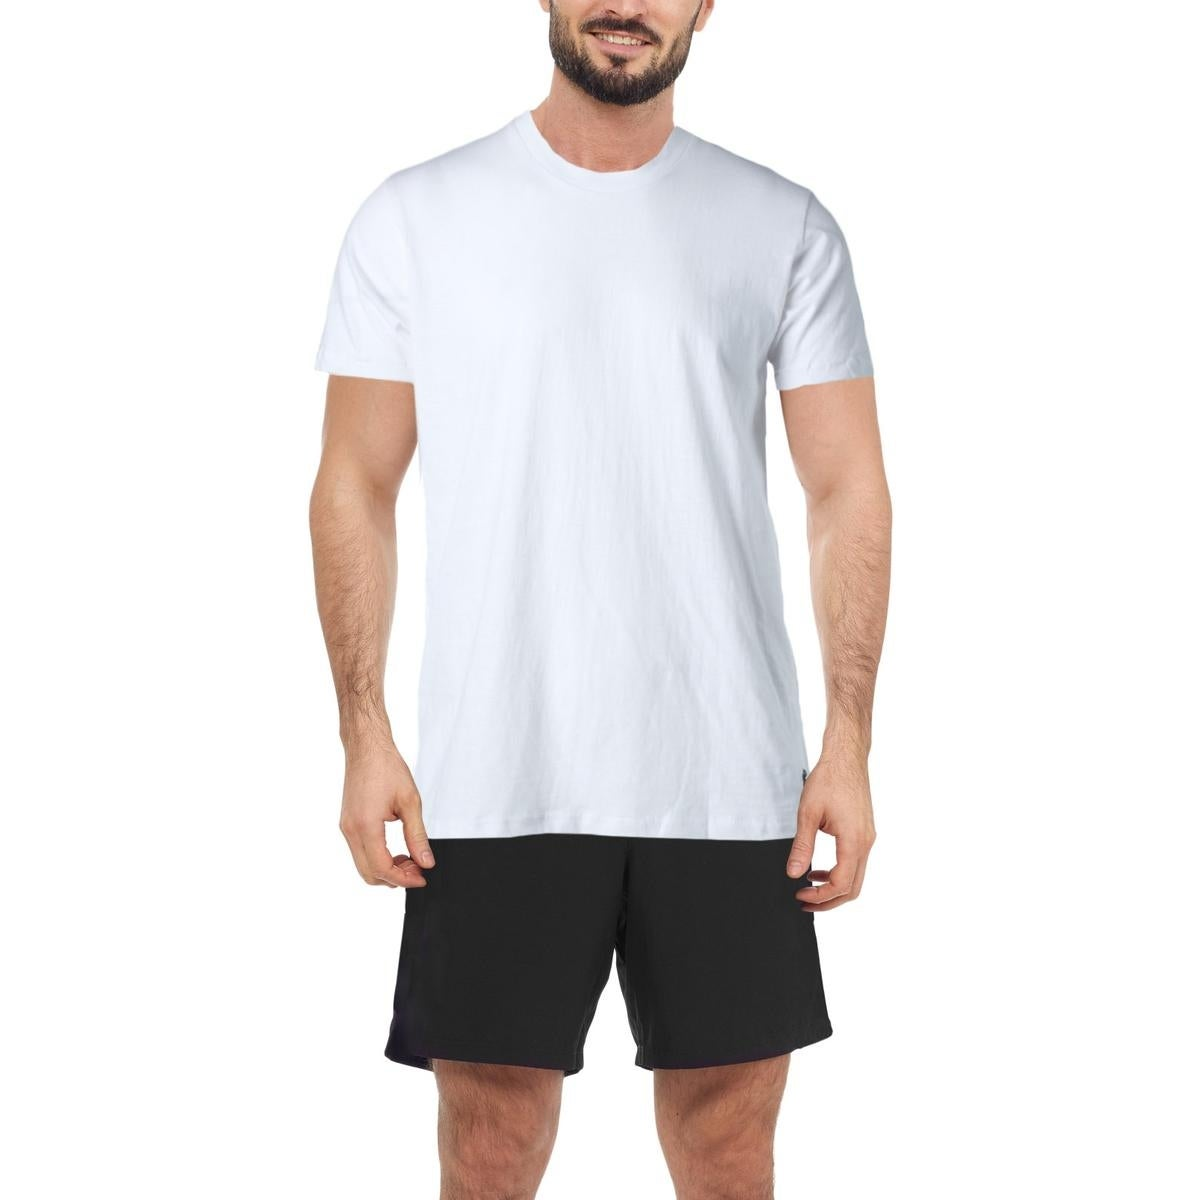 Rocawear Mens Short Sleeve Crew Neck